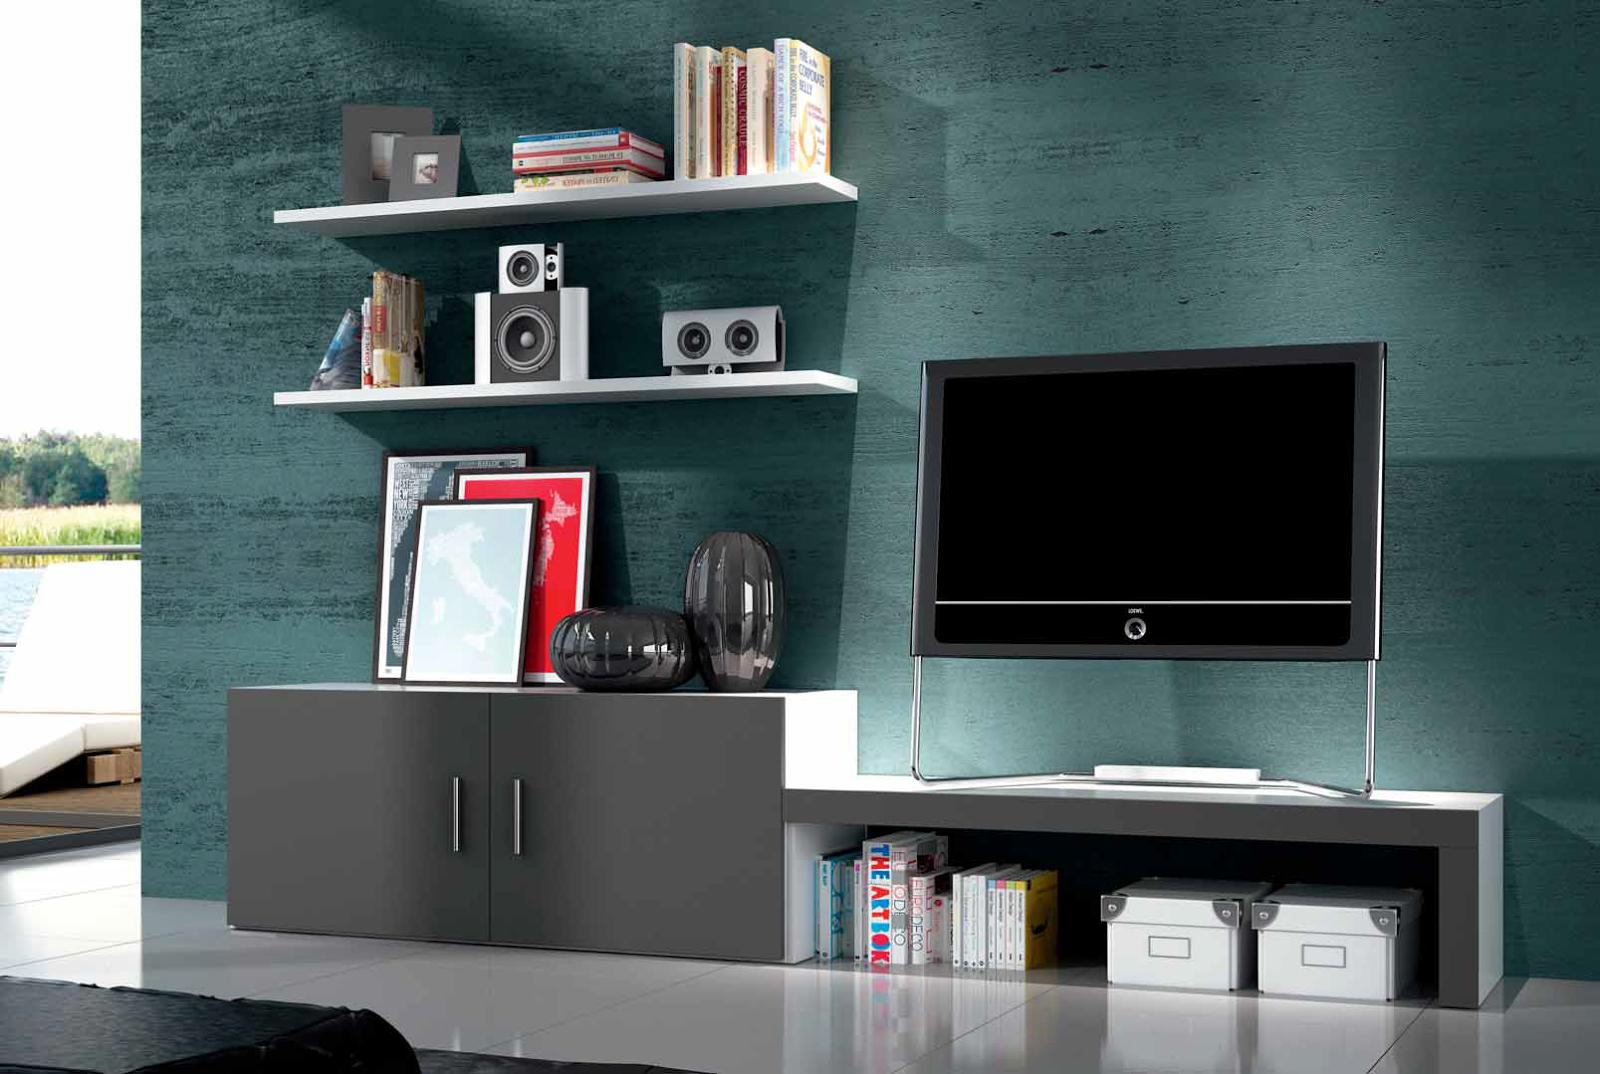 Tu tienda ahorro nuevas ofertas for Ofertas muebles salon